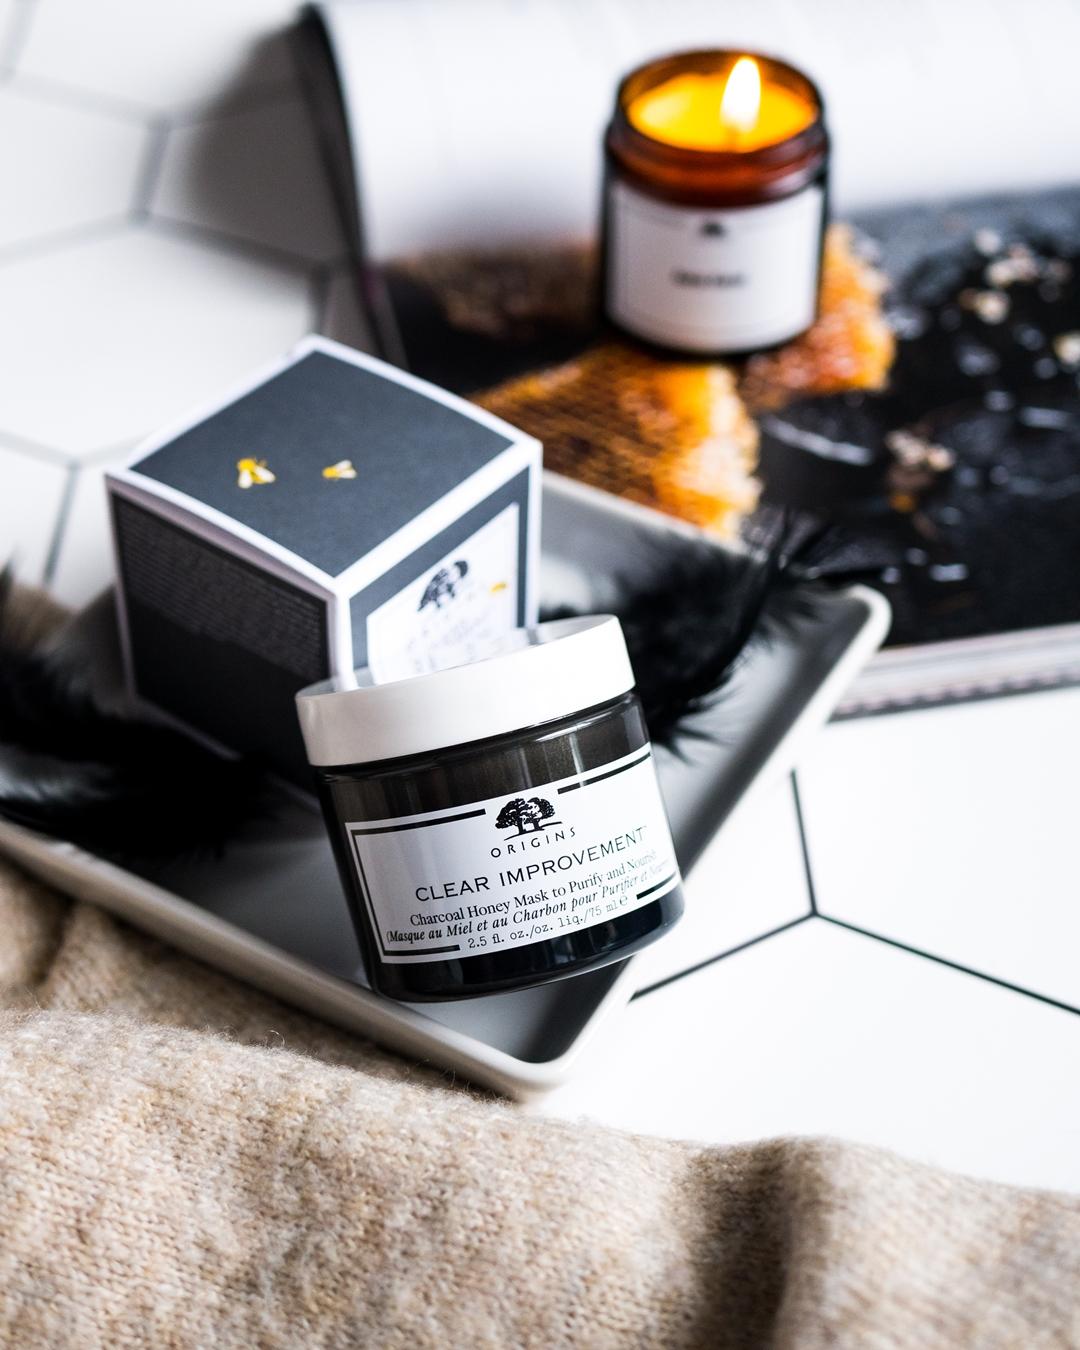 ORIGINS | Clear Improvement Charcoal Honey Mask